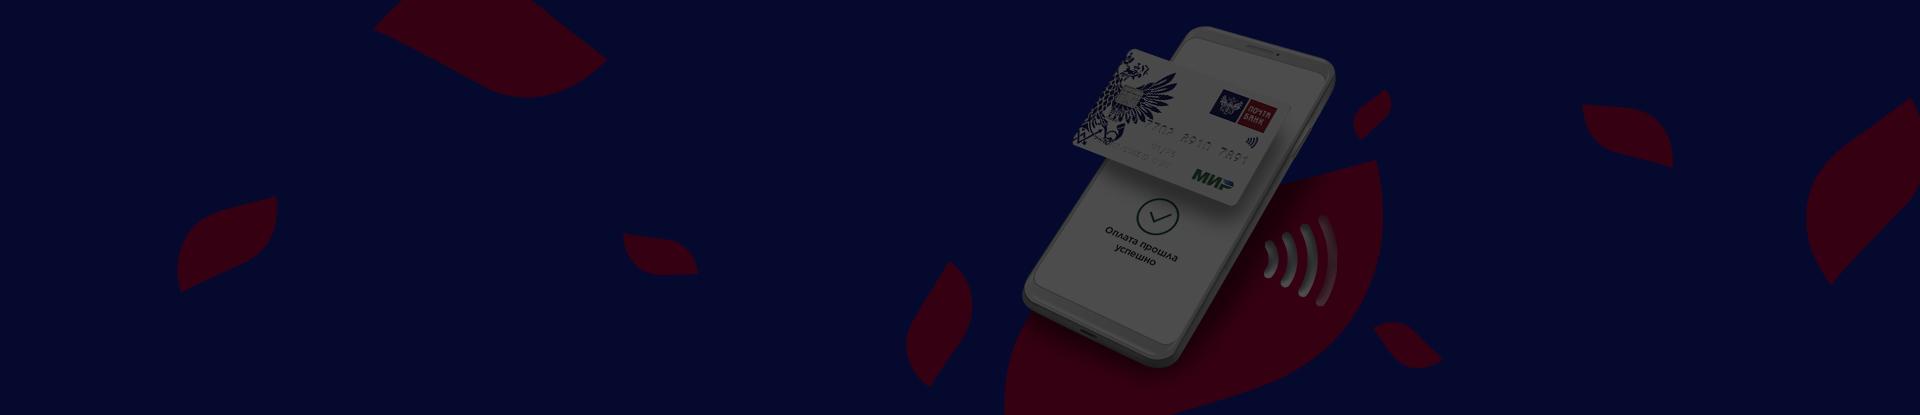 Плати с Mir Pay – получай 500 рублей